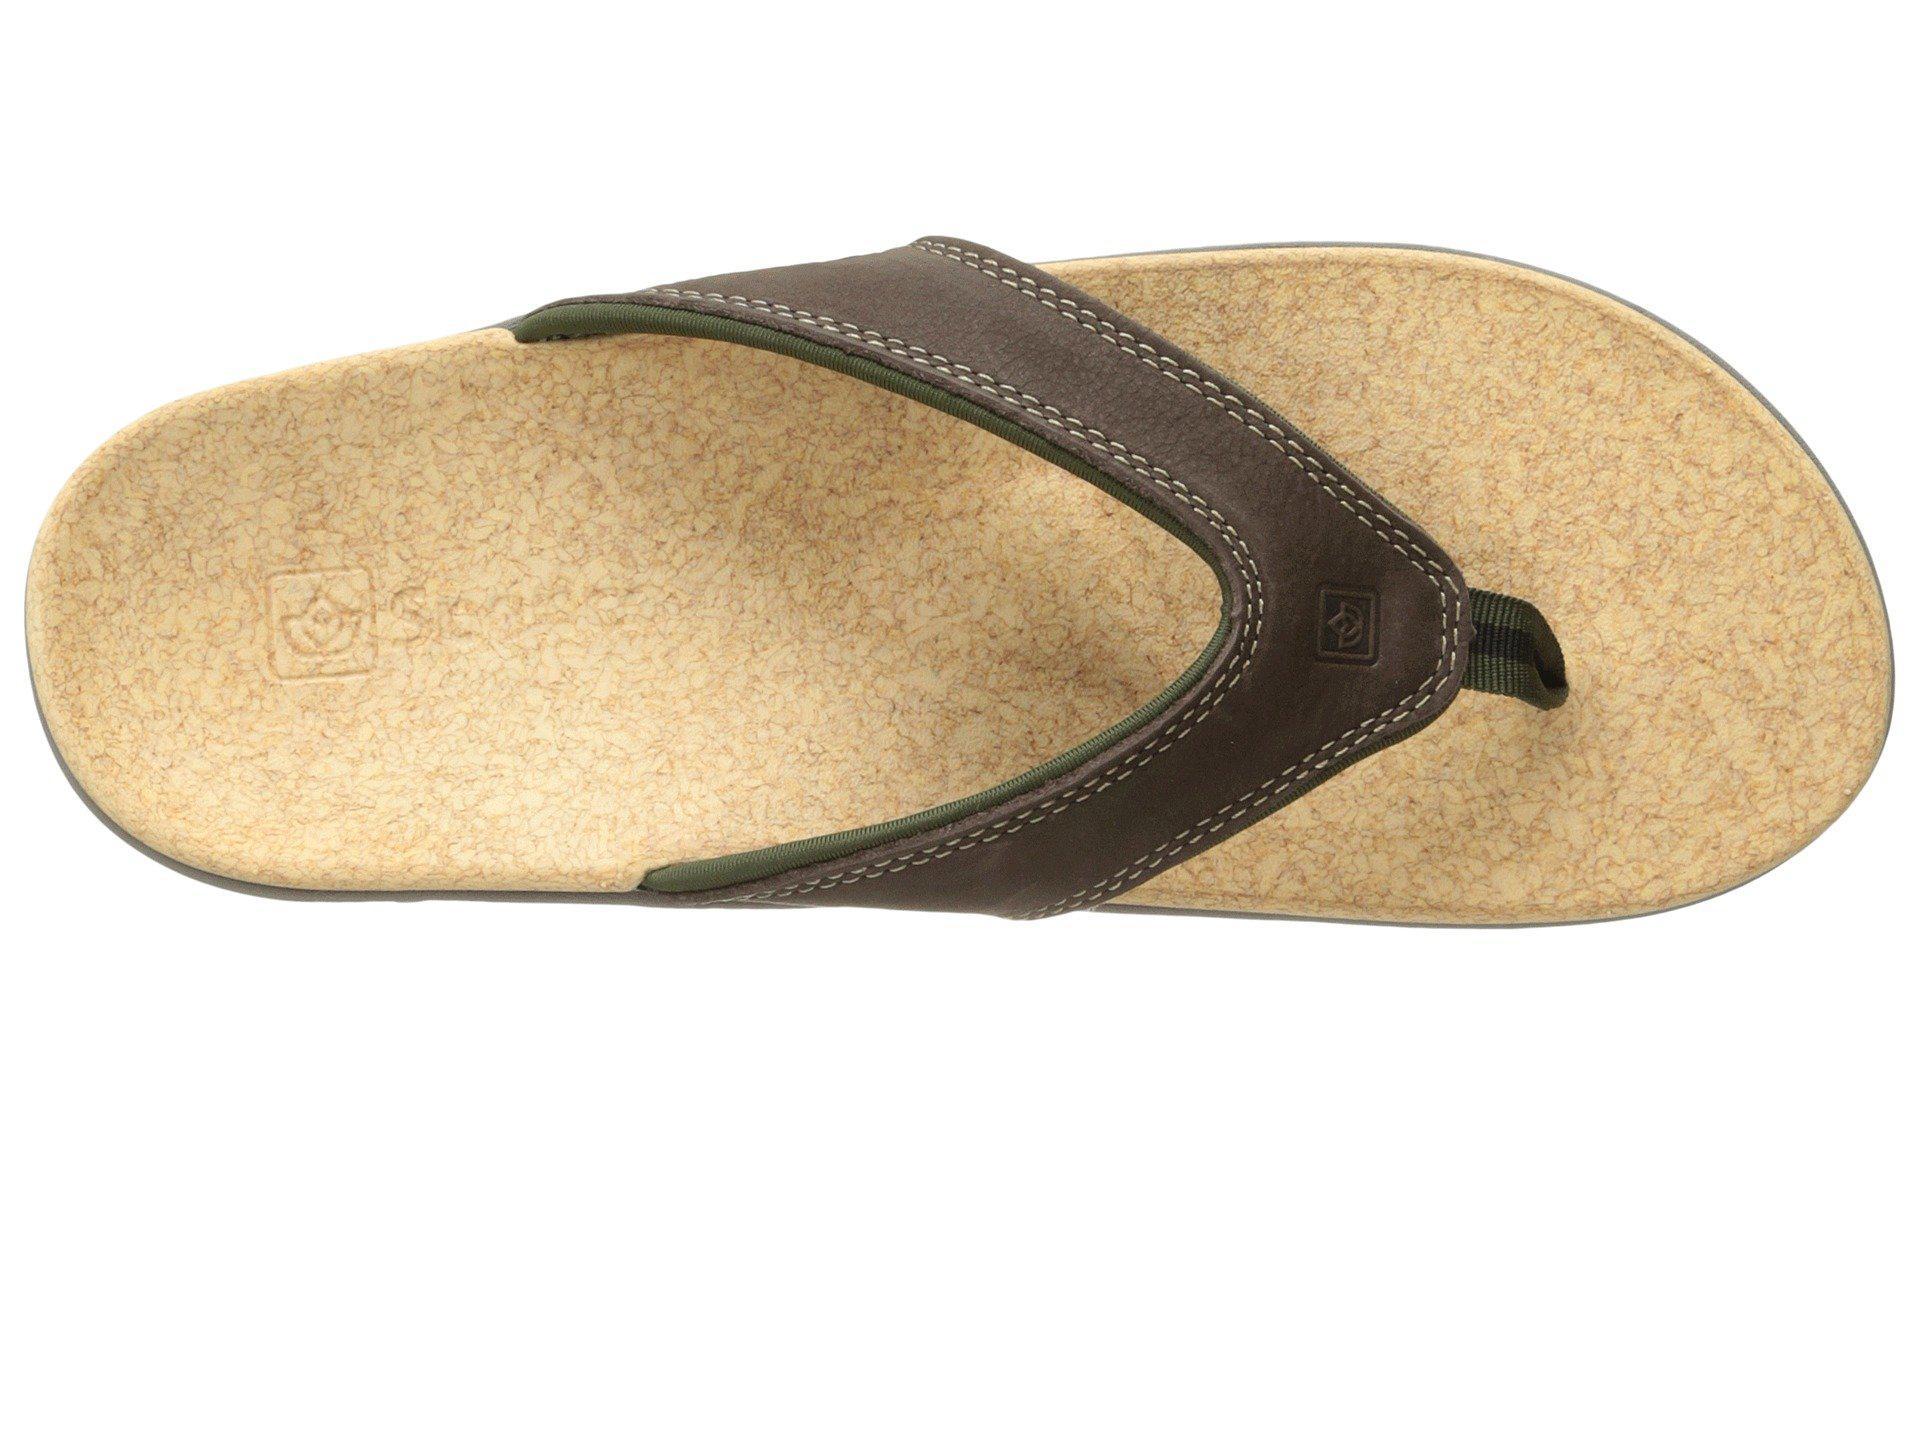 e3ad32039c3 Spenco - Brown Yumi (carbon pewter) Men s Sandals for Men - Lyst. View  fullscreen